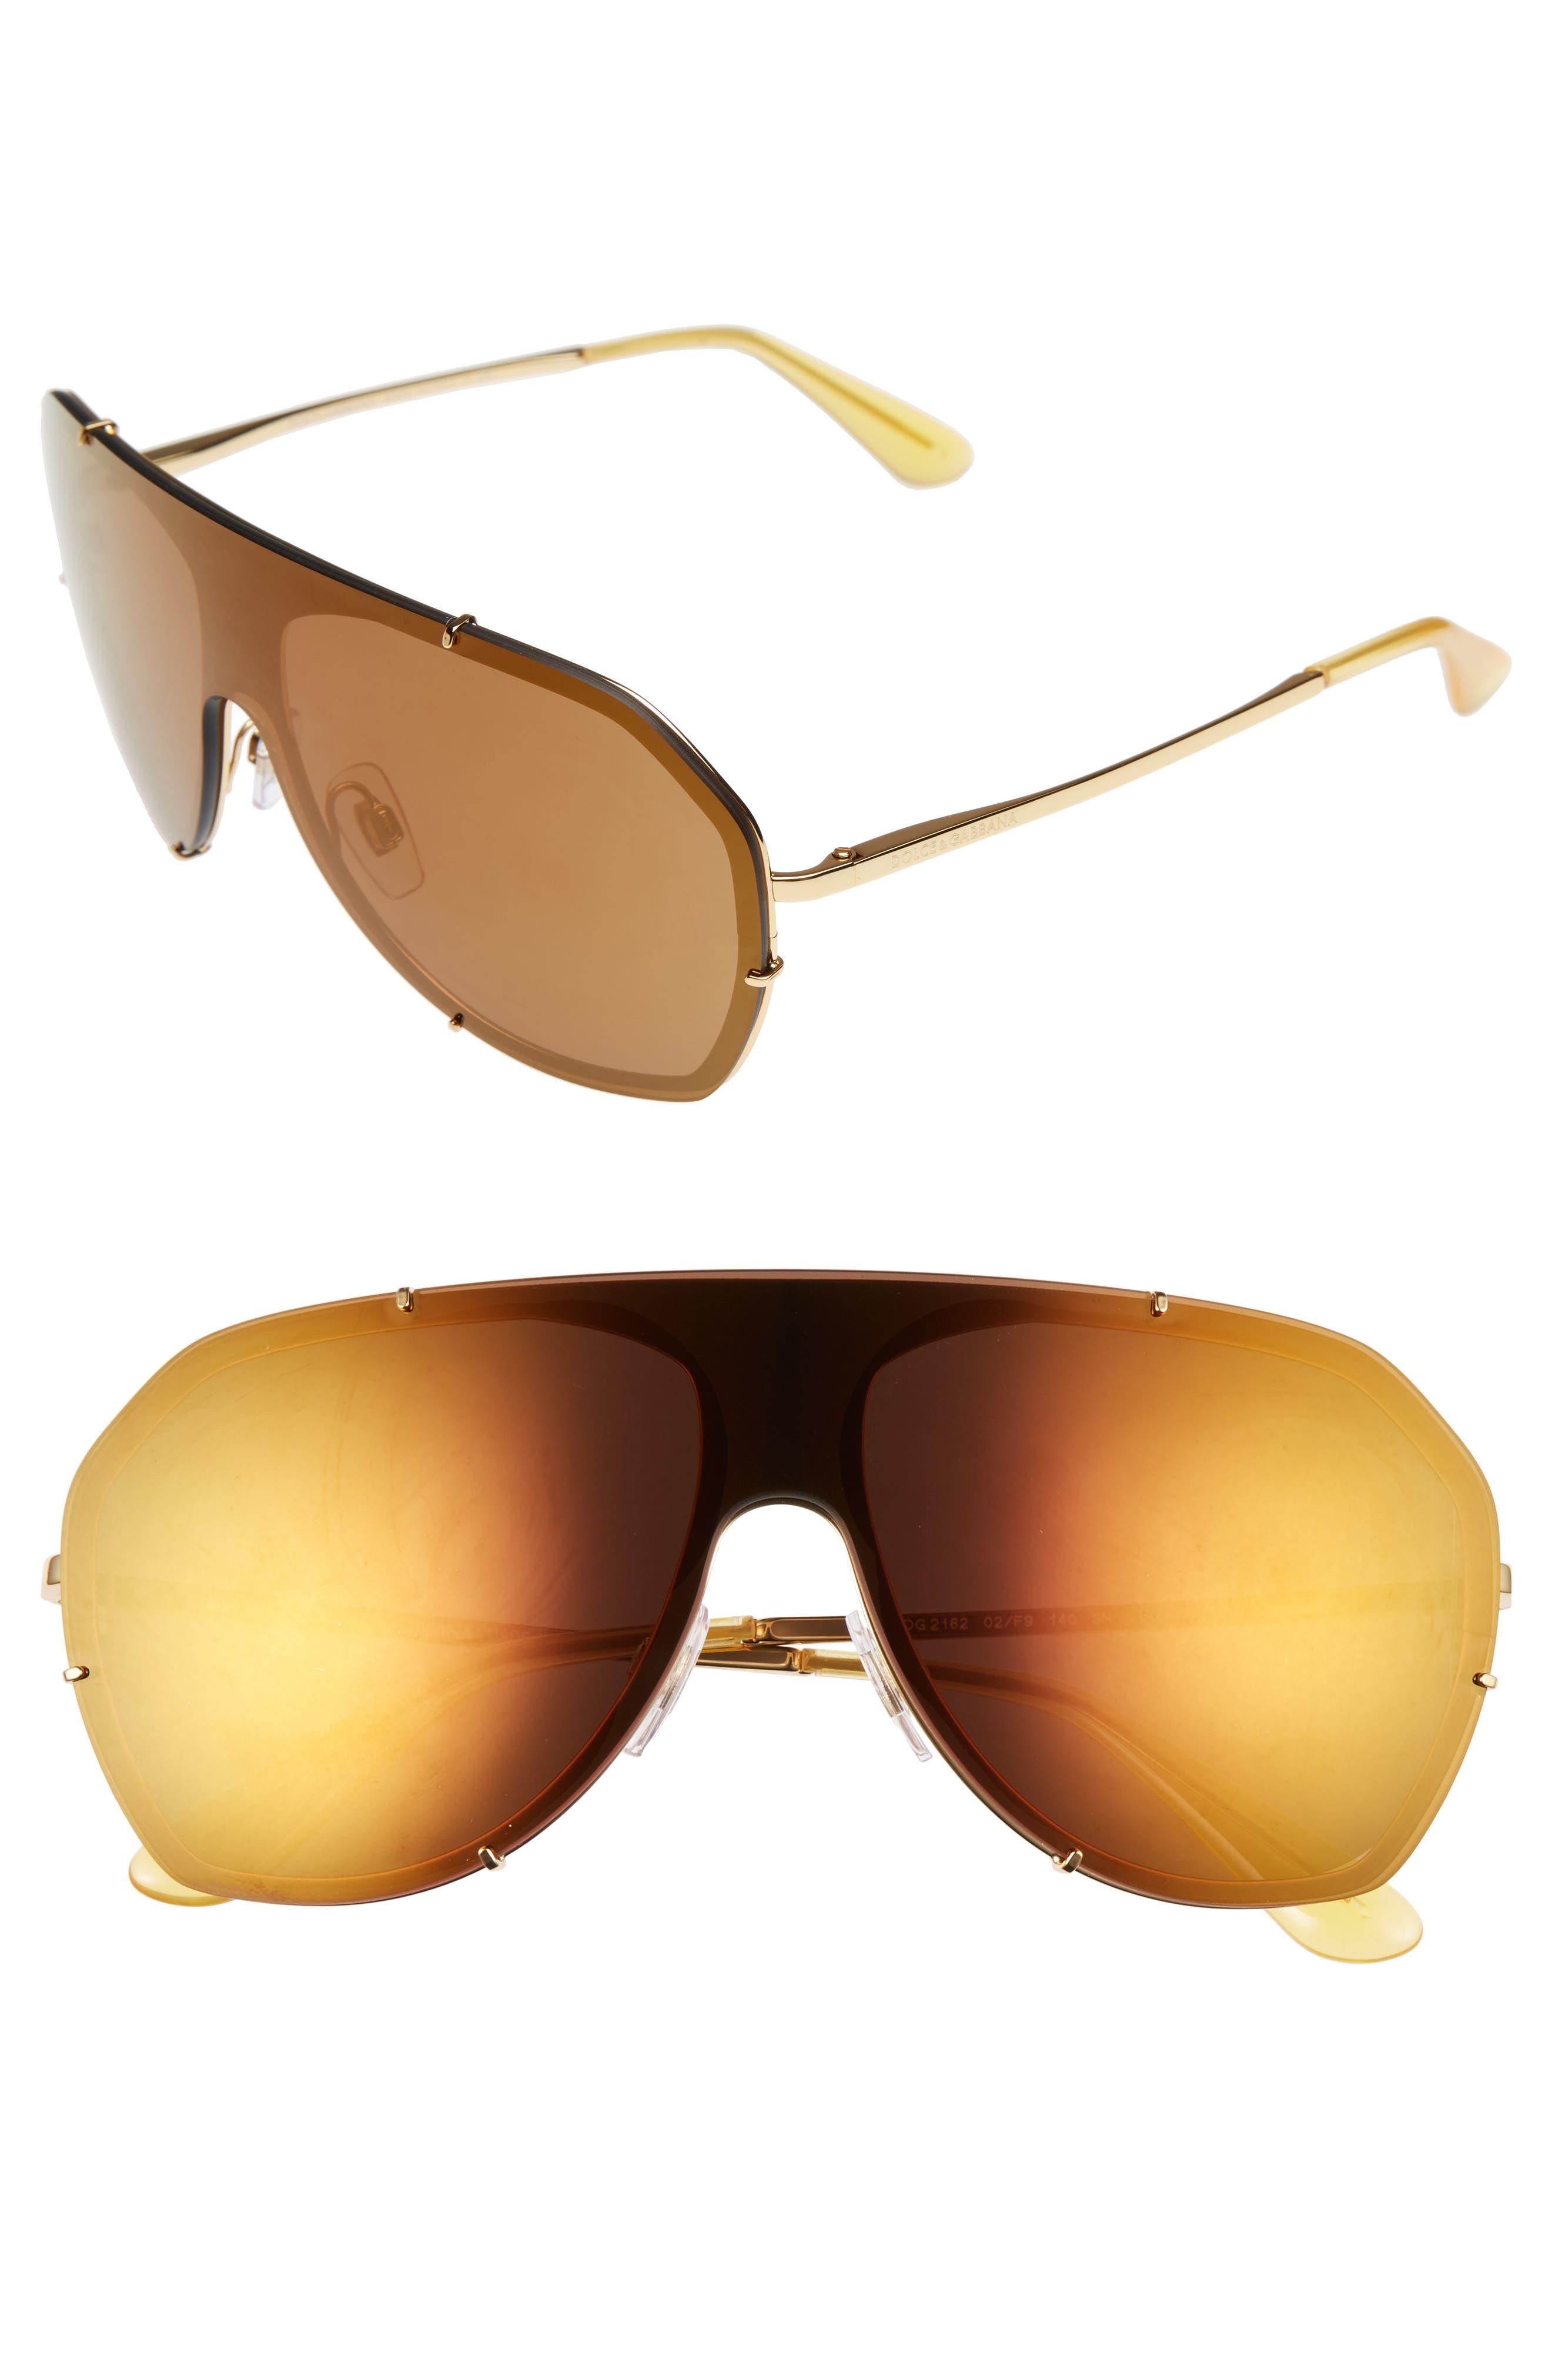 Dolce&Gabbana 60mm Aviator Sunglasses